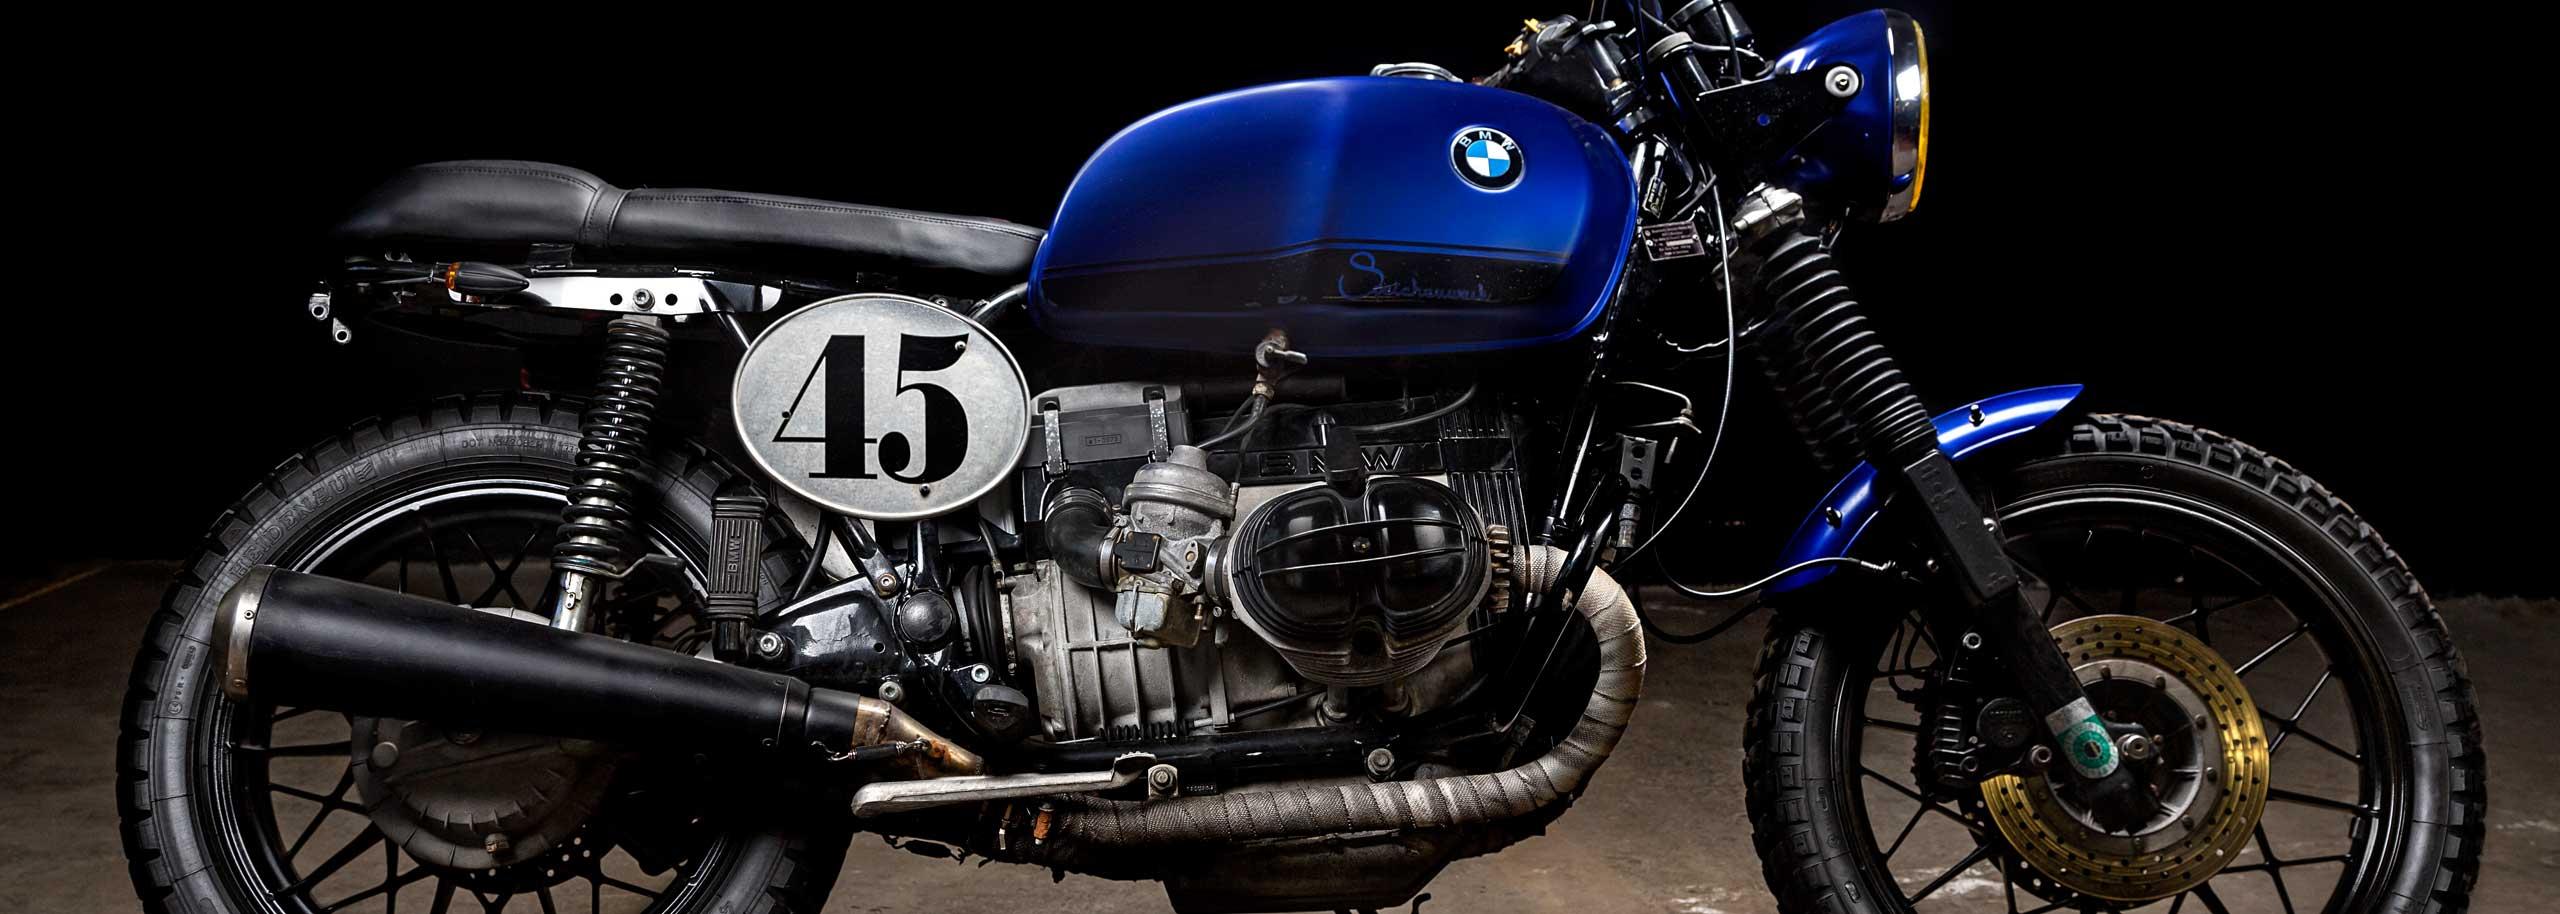 03_TITAN-Milano_BMW-R100-RS_Cafe-Racer-Motorrad-Umbau-Graz-Austria-Heidenau_BMW-Motorrad-Umbauten_individuell-TYPISIERT